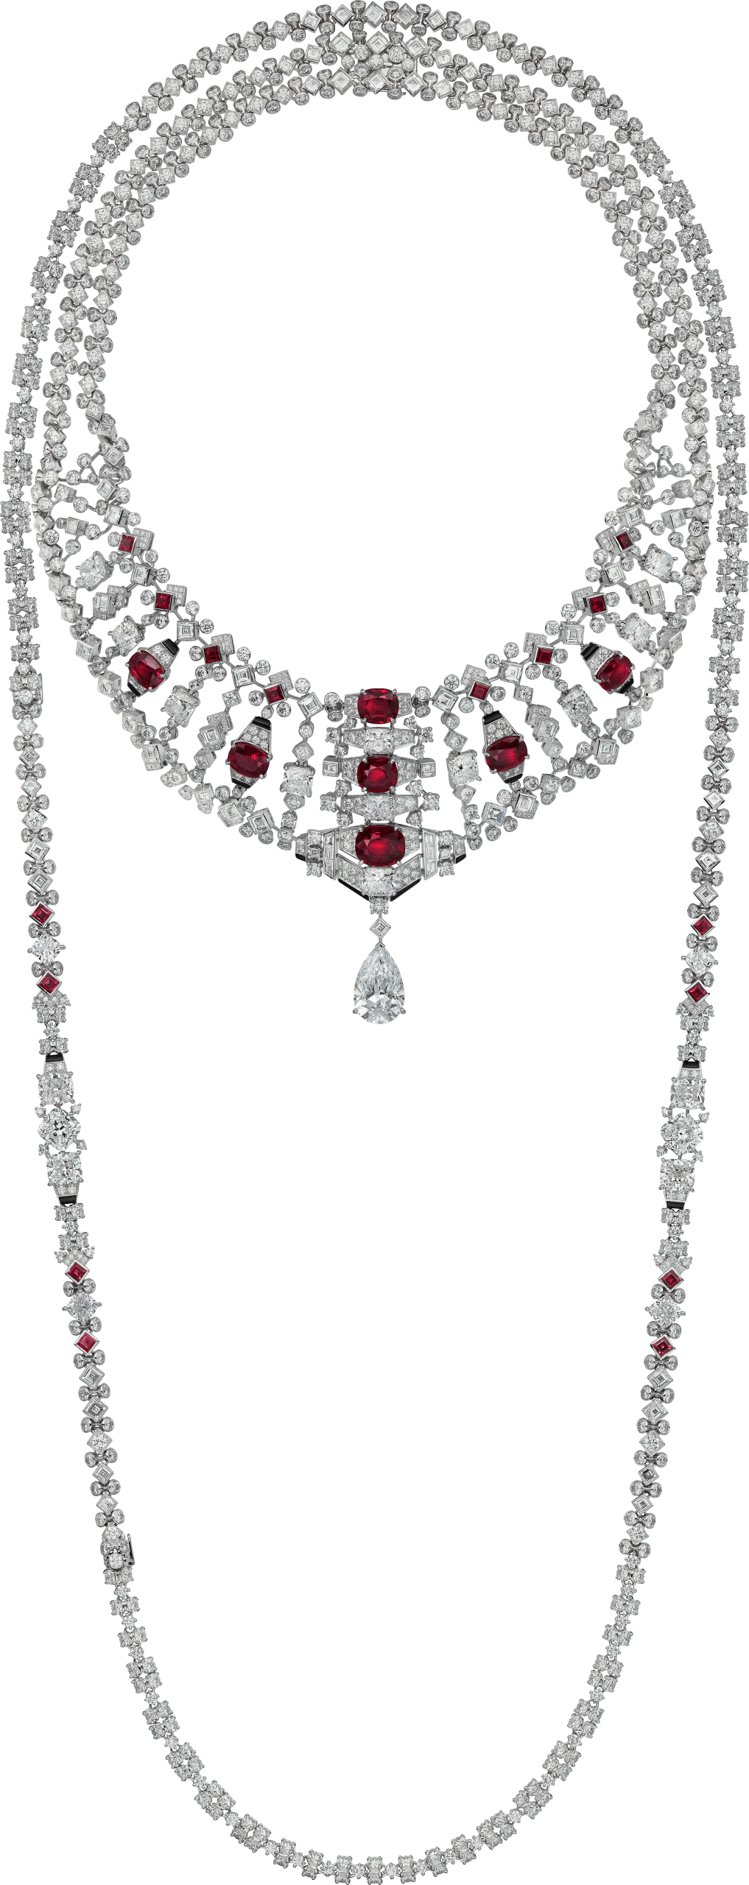 Cartier,VARANTIA紅寶石鑽石項鍊,鑲嵌七顆共重17.61克拉的天然...